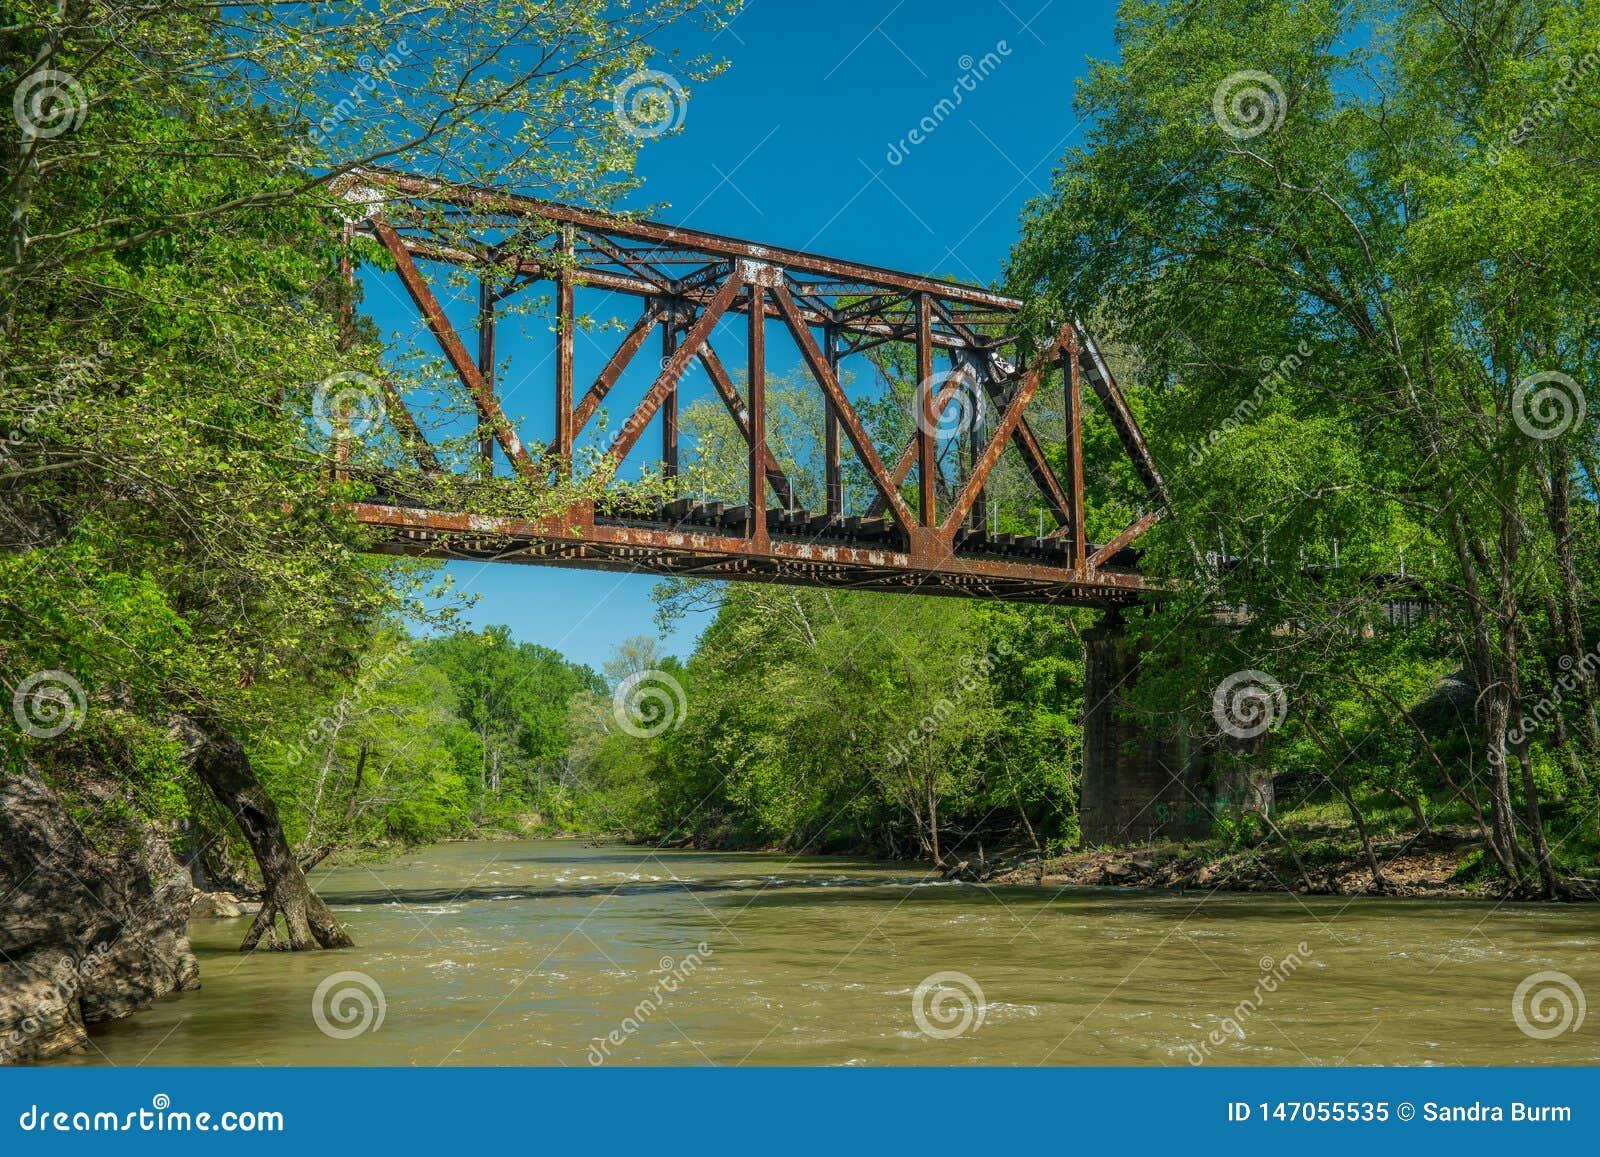 A river flowing underneath a train trestle